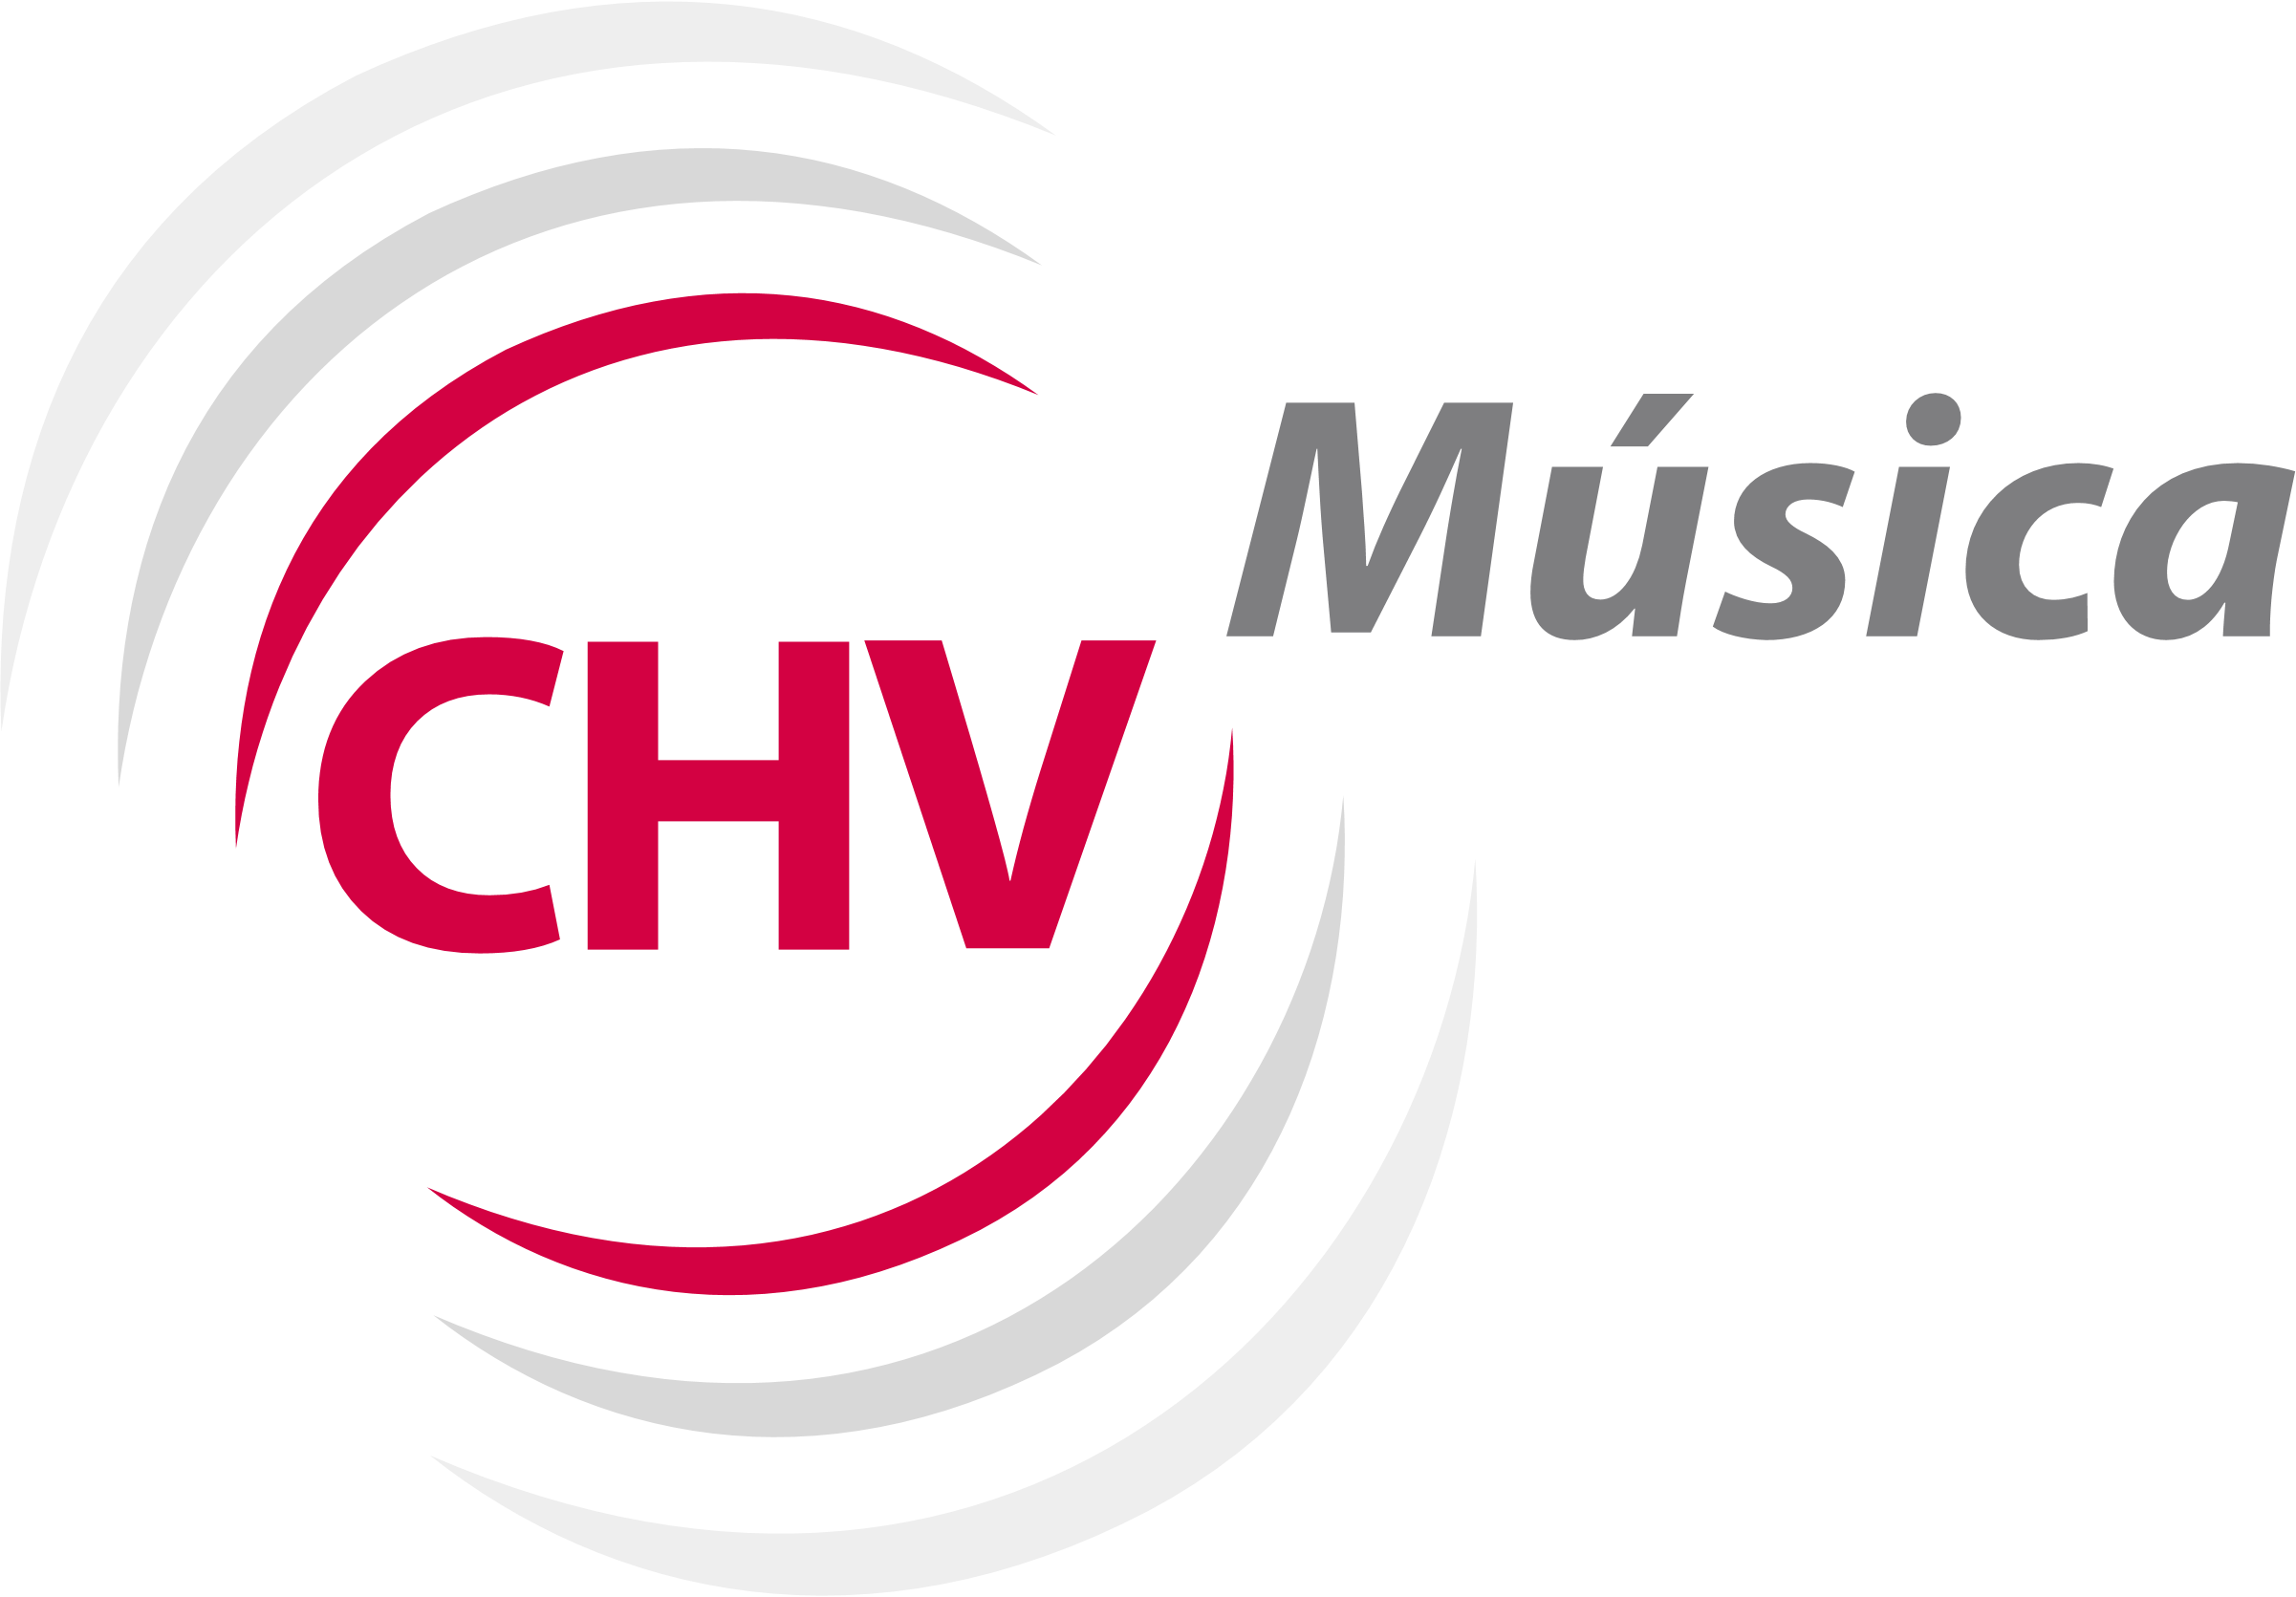 Chilevisión Música